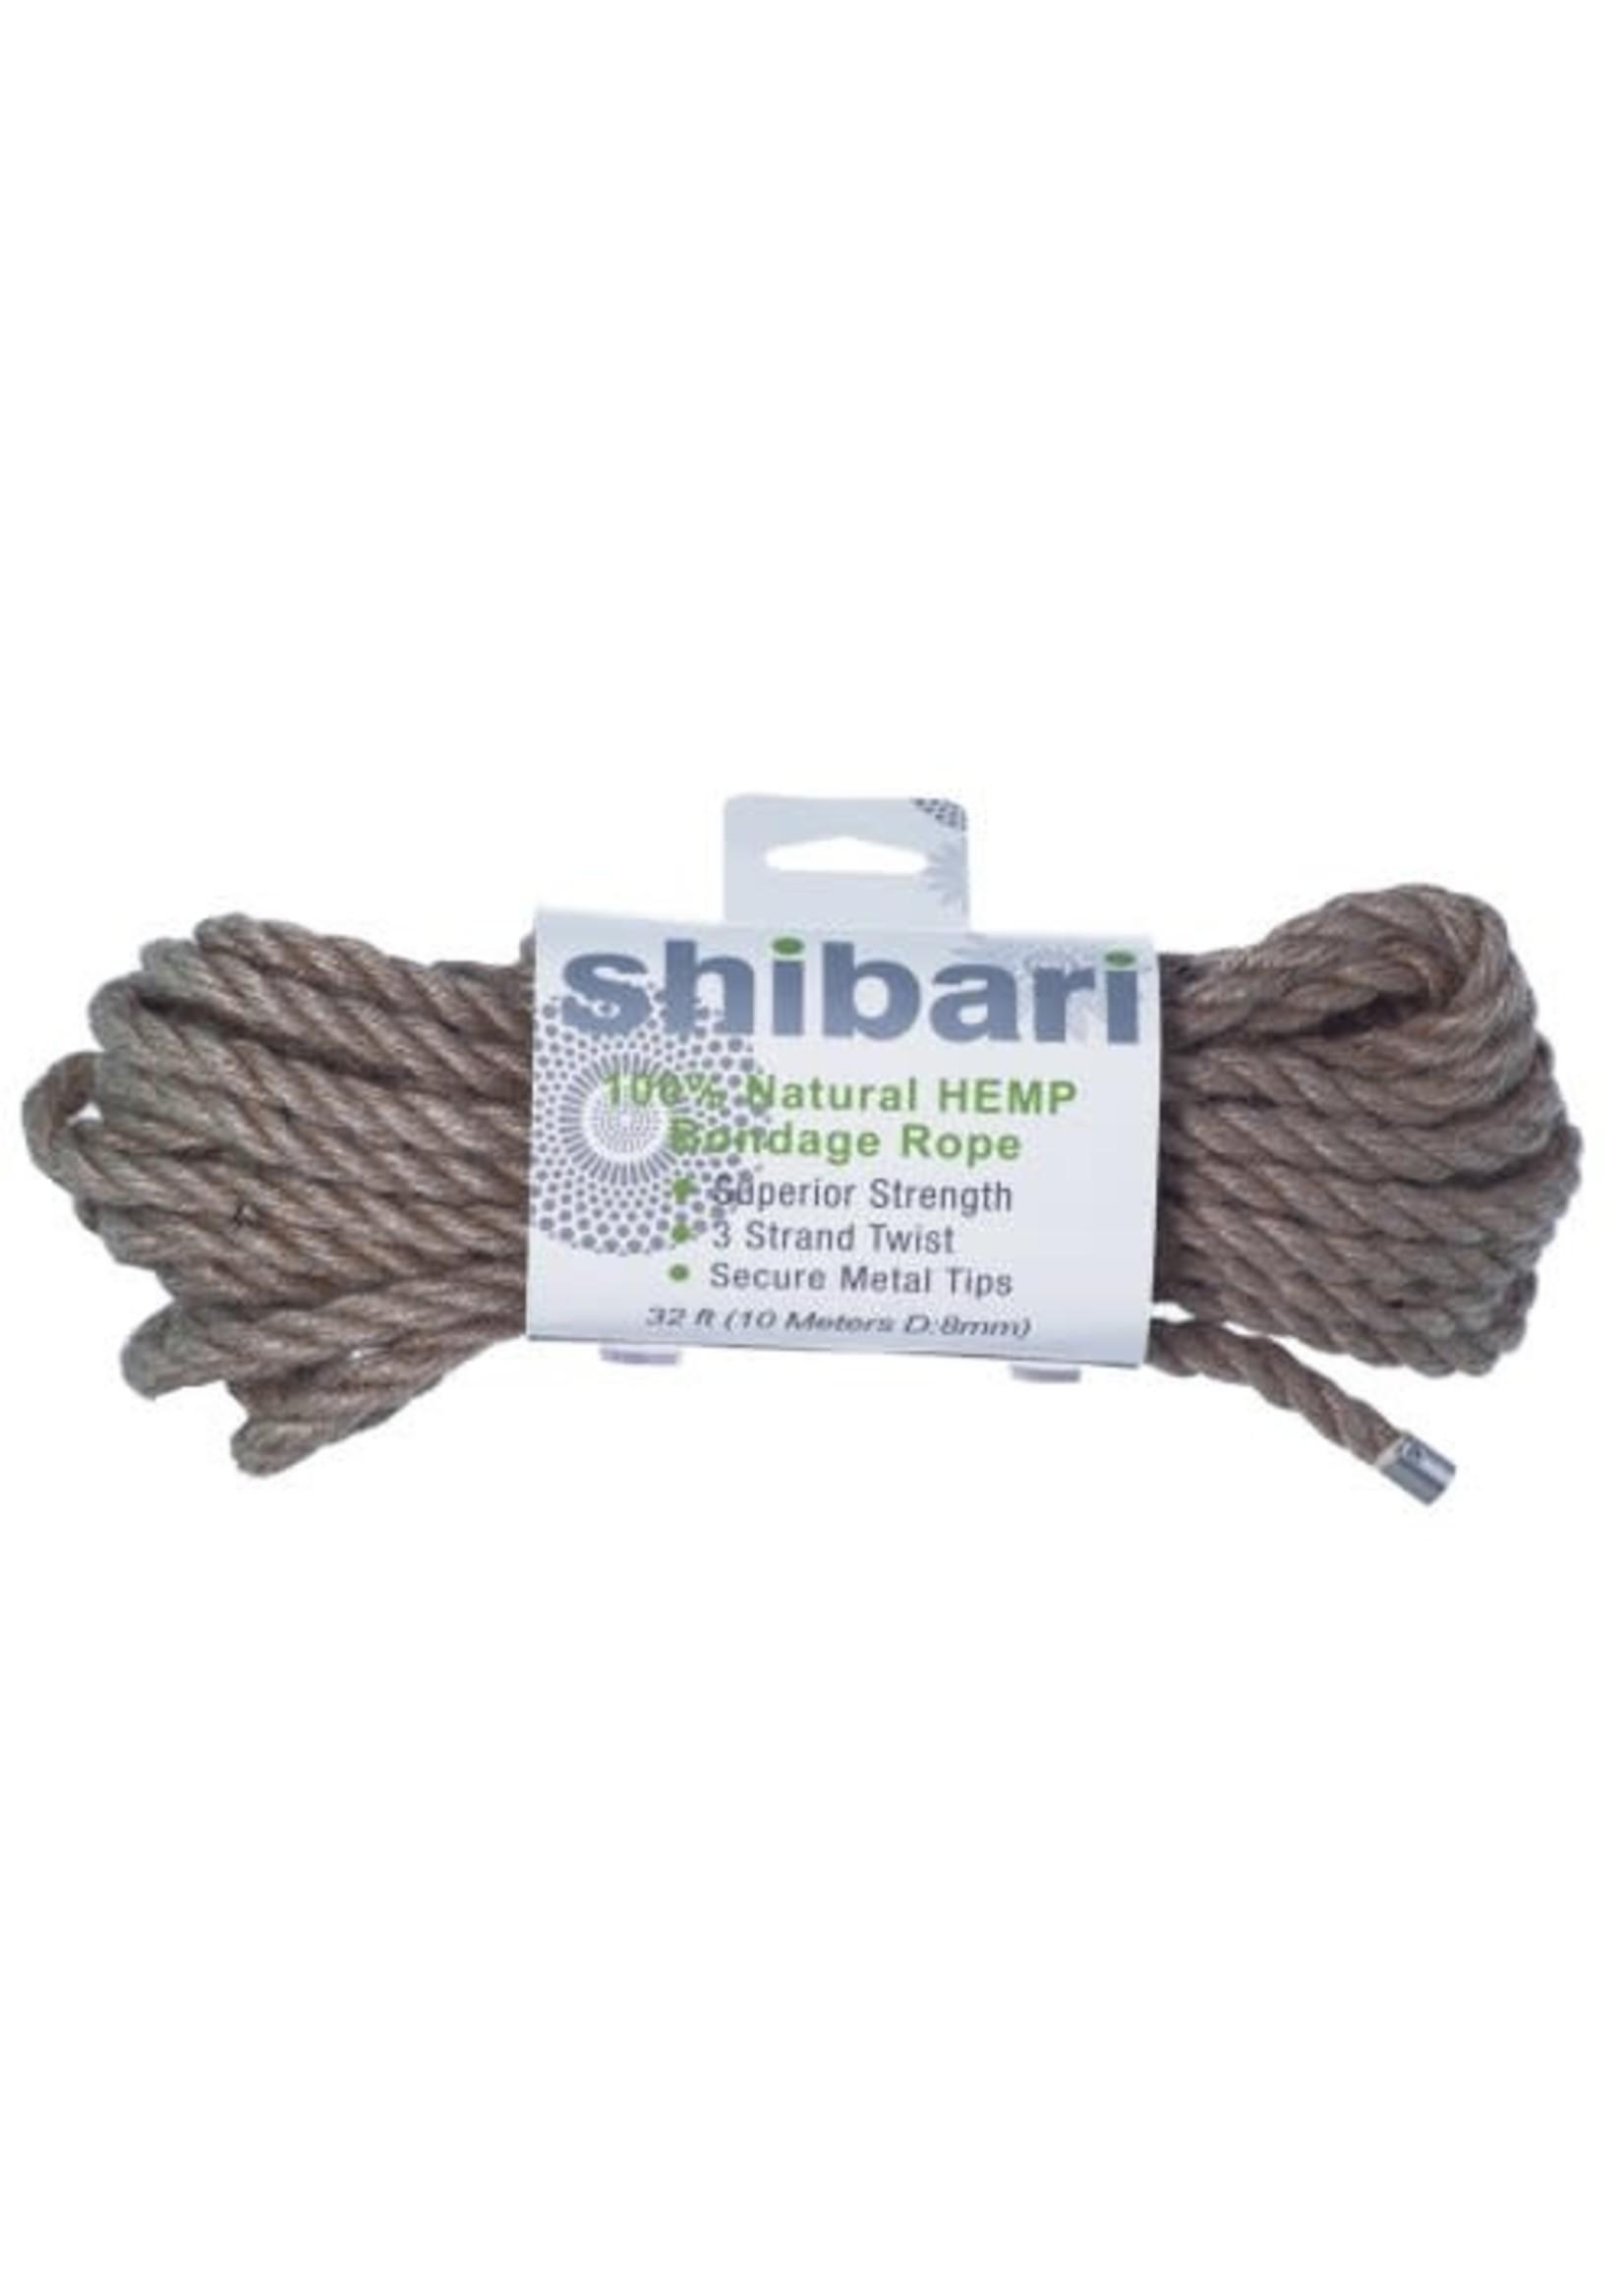 ShiBari Hemp Rope 32'